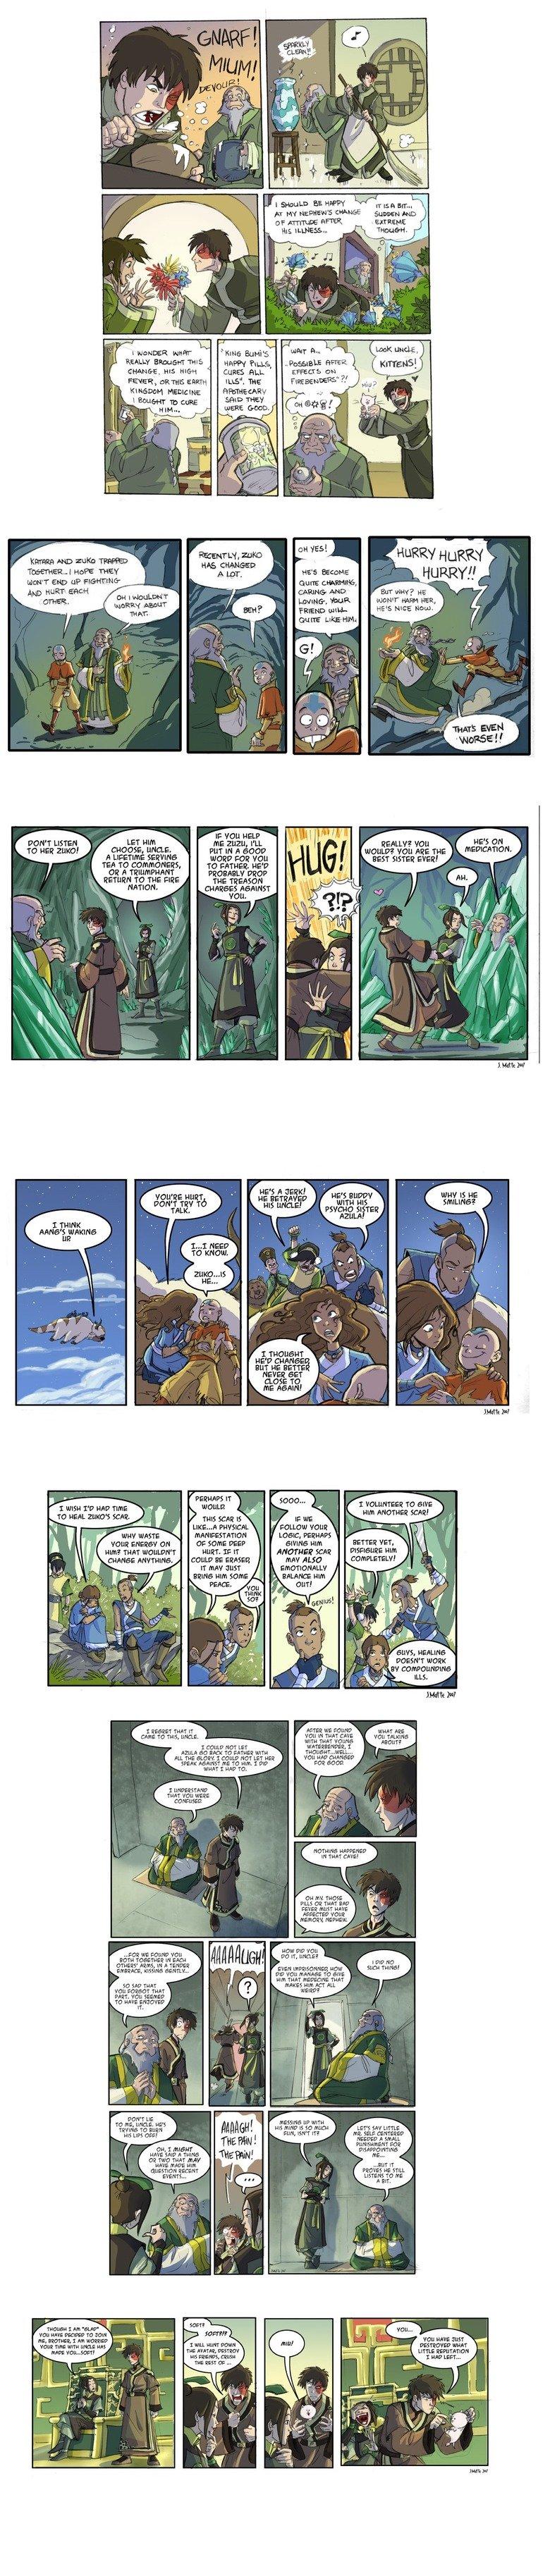 Avatar Comic Comp. Comics based on the season 2 finale .. poor zuko